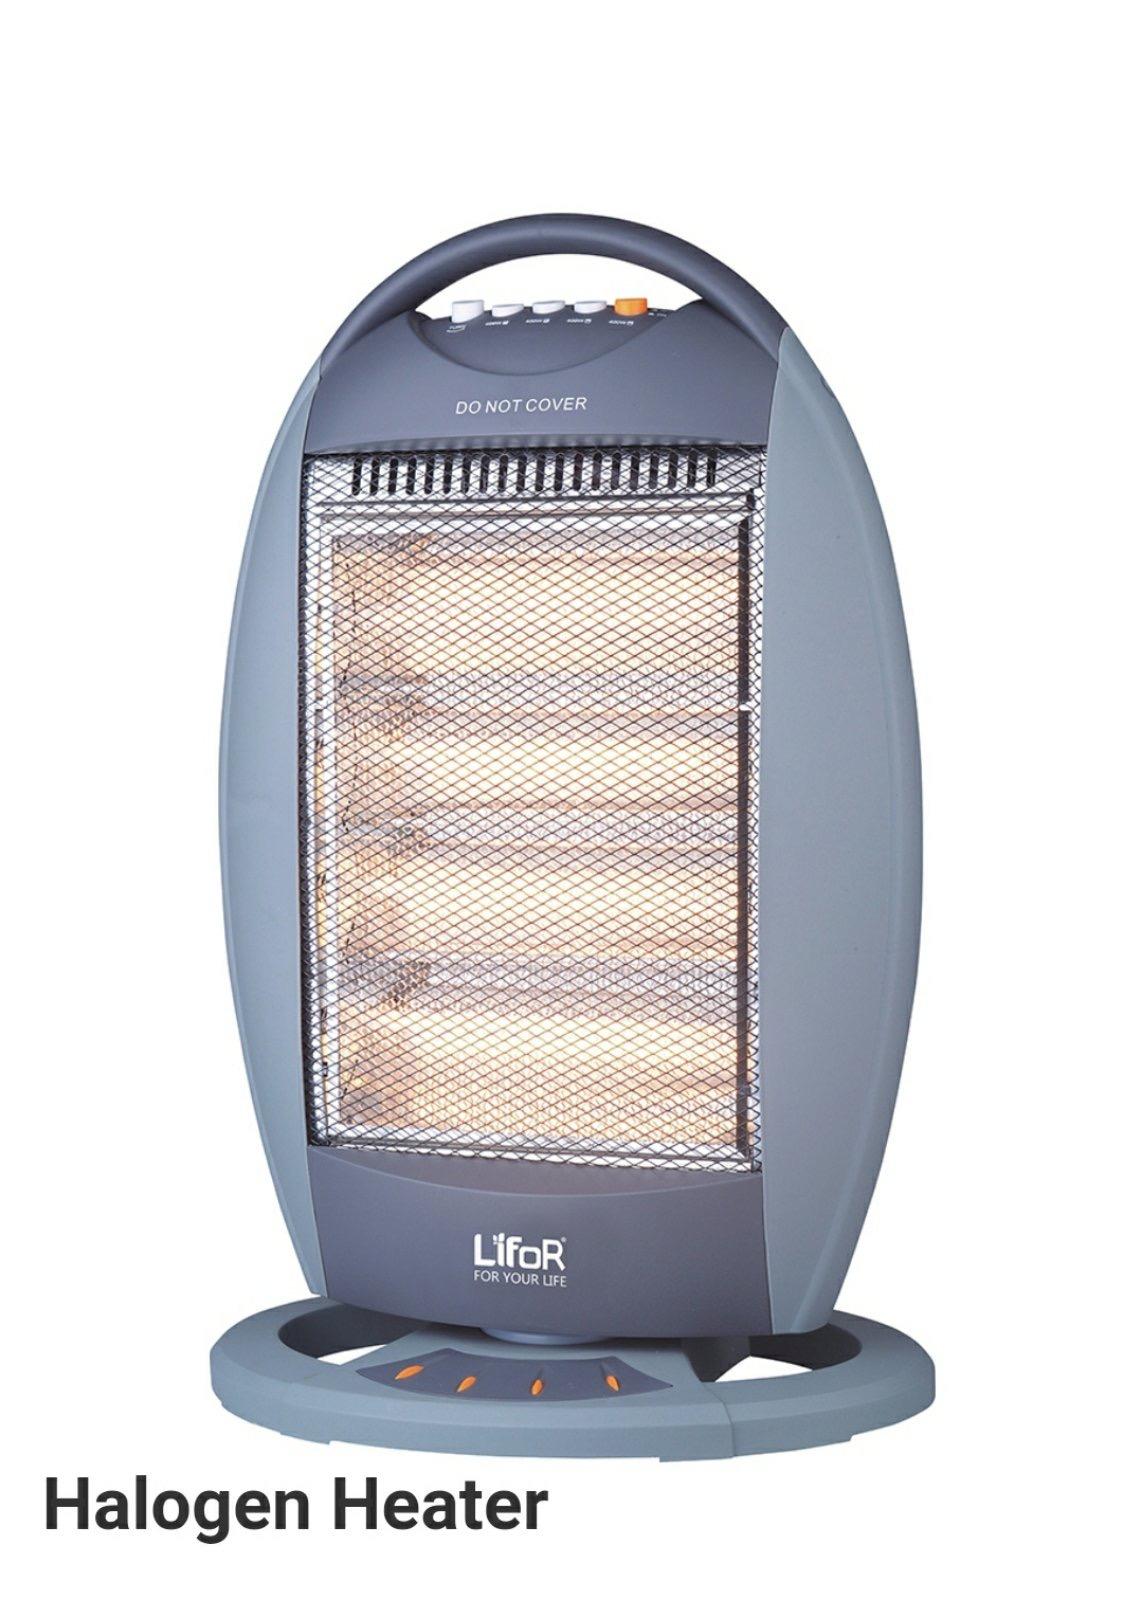 Lifor Halogen Heater LIF-HH16A